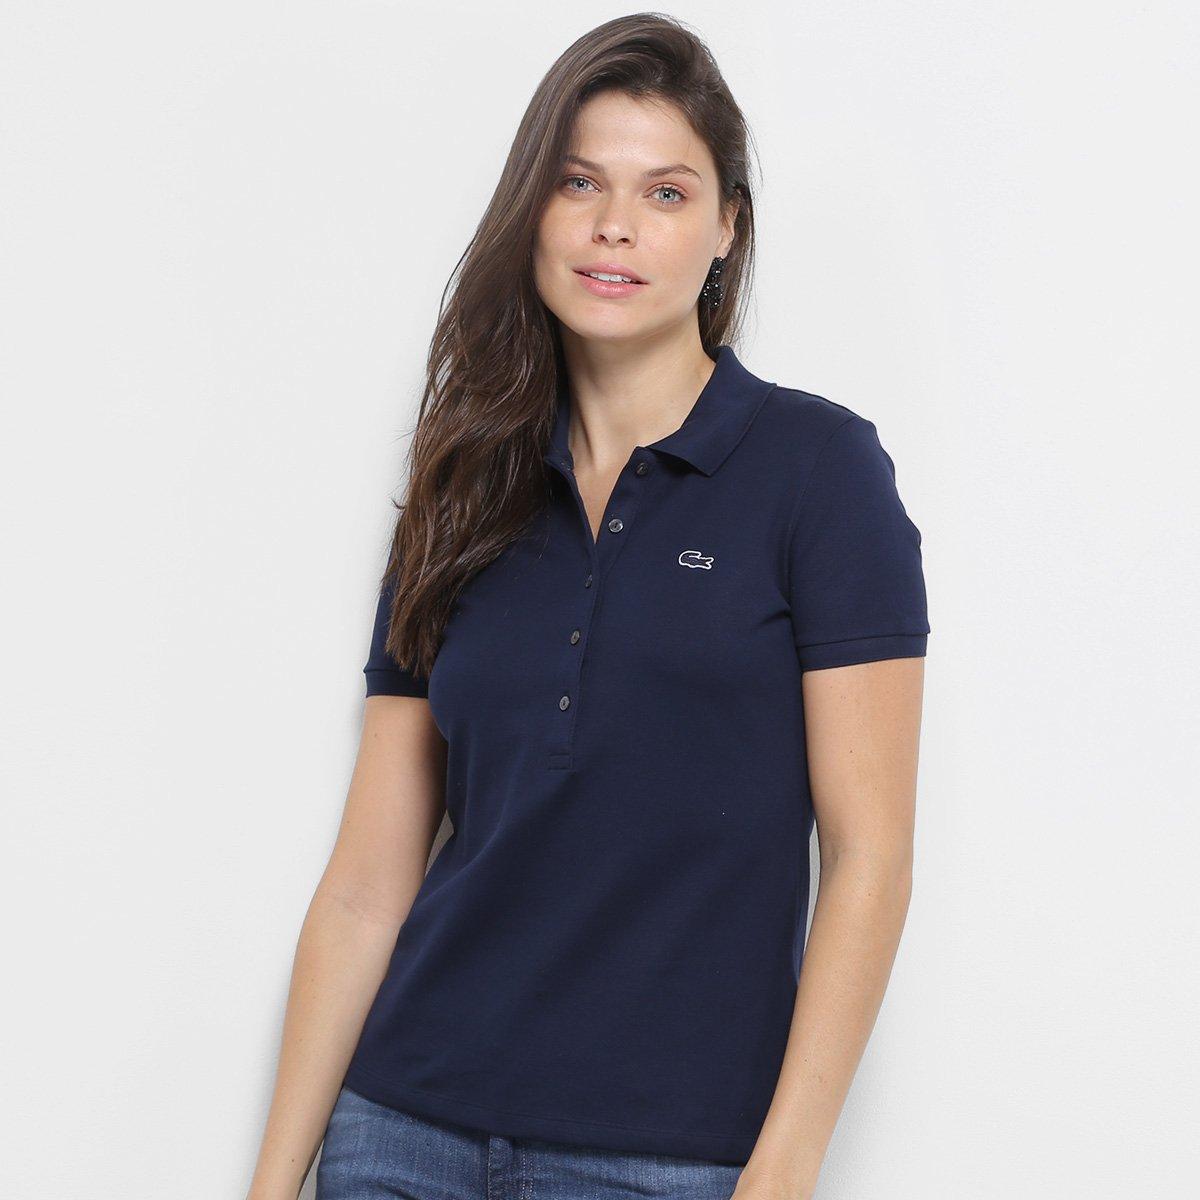 Camisa Polo Lacoste Piquet Manga Curta Feminina - Compre Agora ... 381806e532ca8